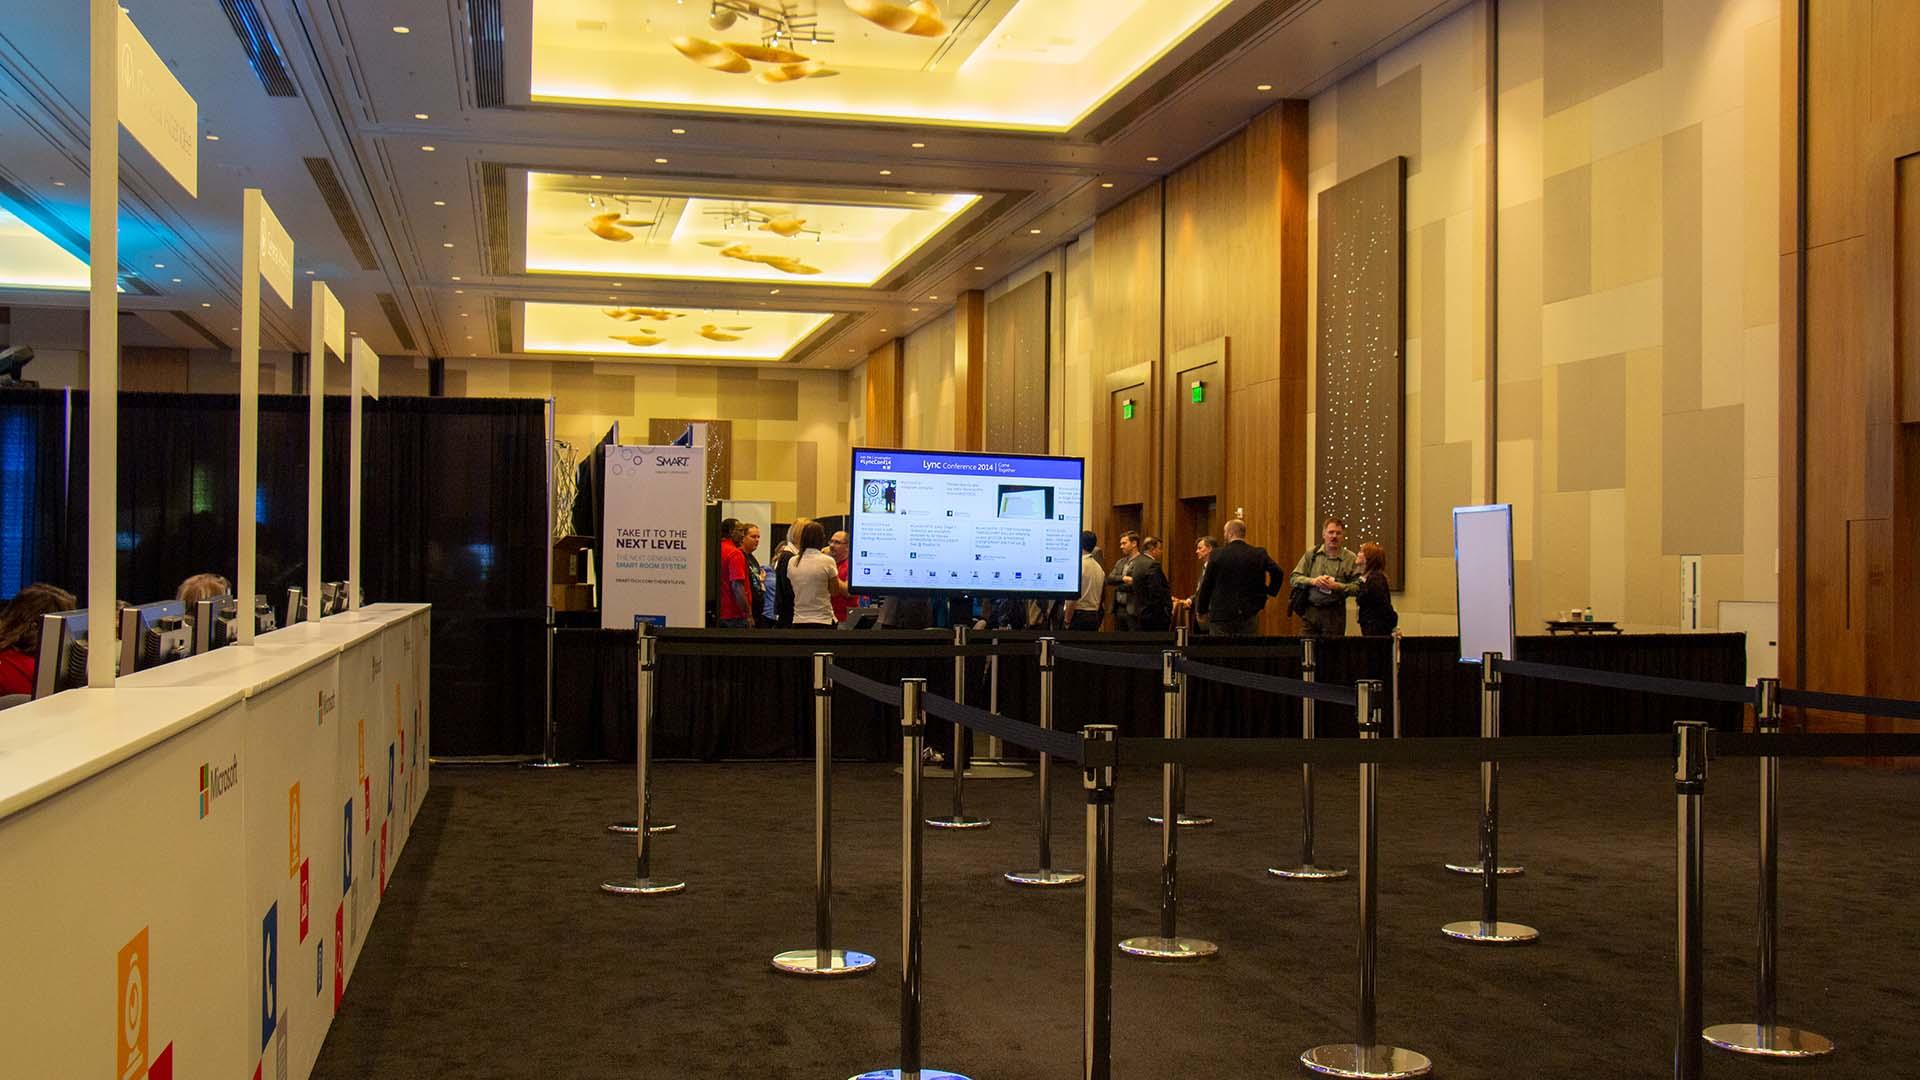 Microsoft Lync Conference Check-In